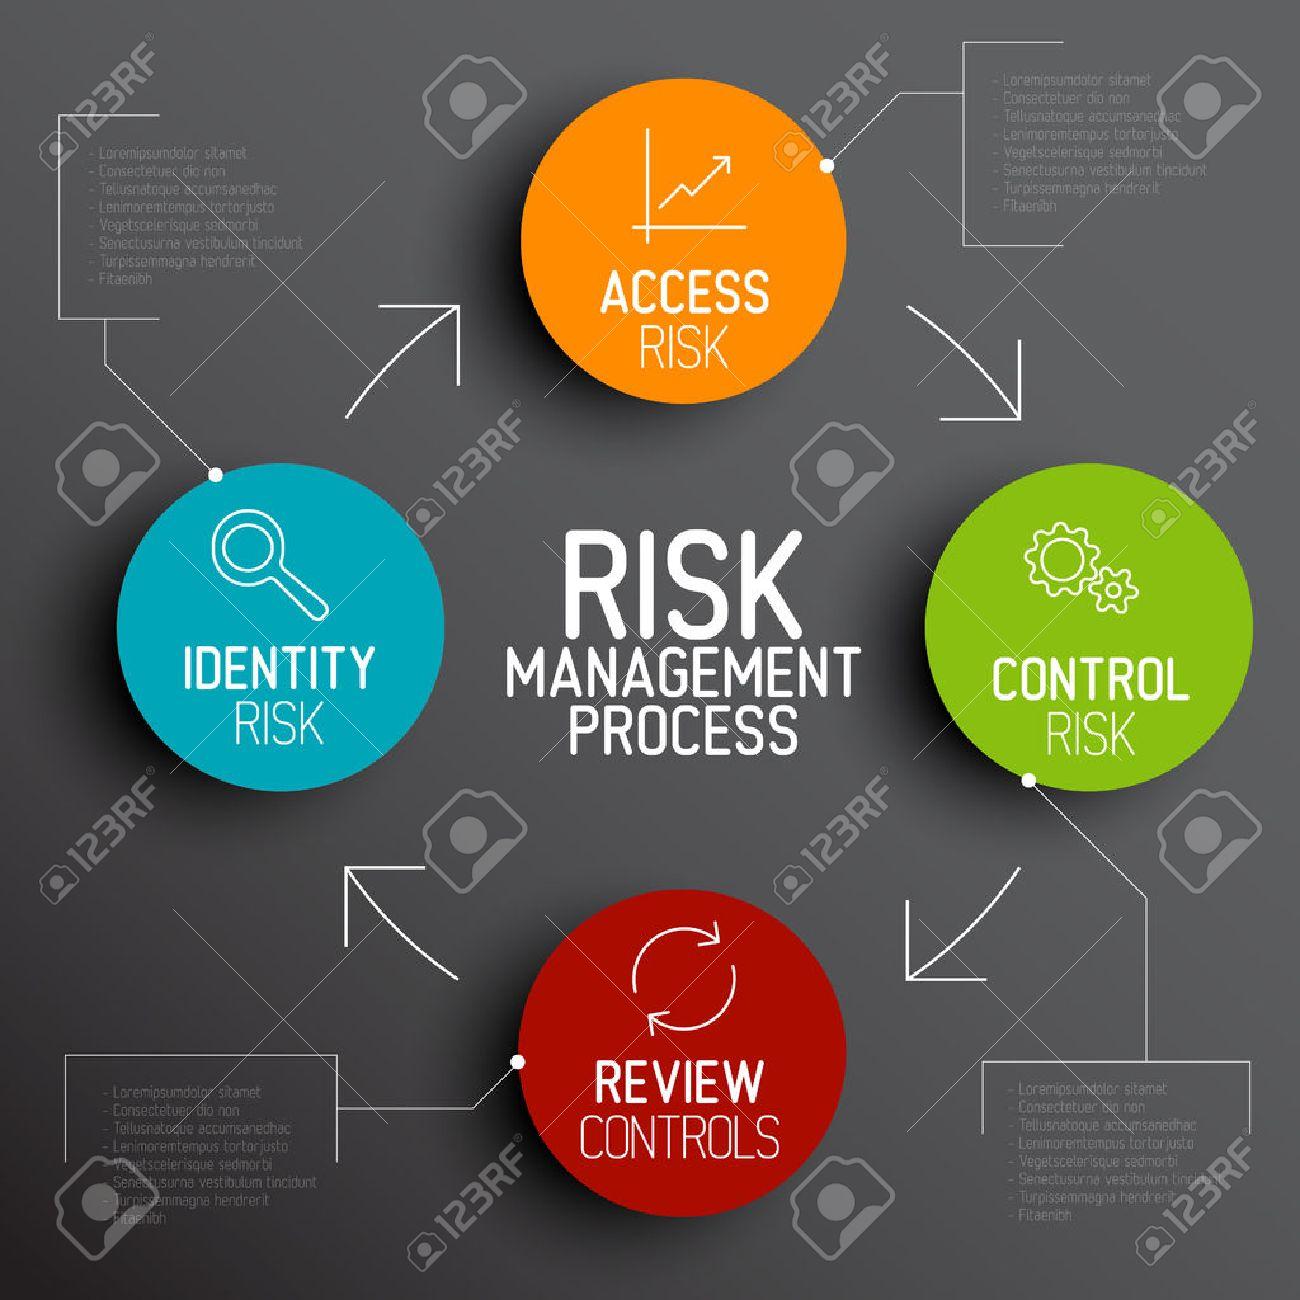 risk management process diagram schema with description stock vector -  28682370